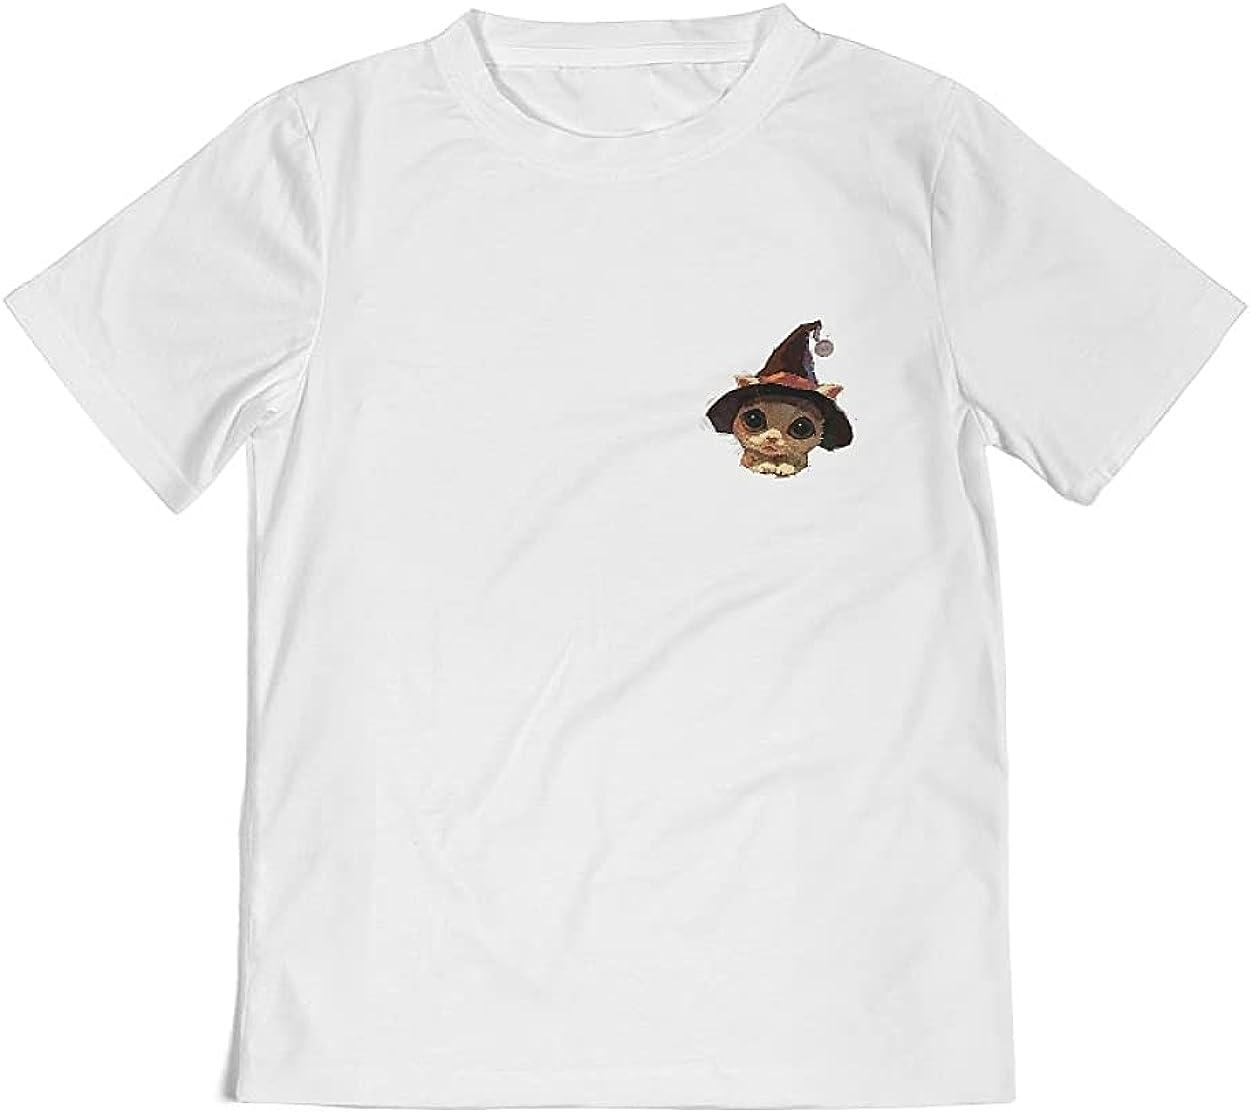 Kids Short Sleeves Shirt Tops Tee Shirt Crewneck Graphic Tee for Boy Girl Youth